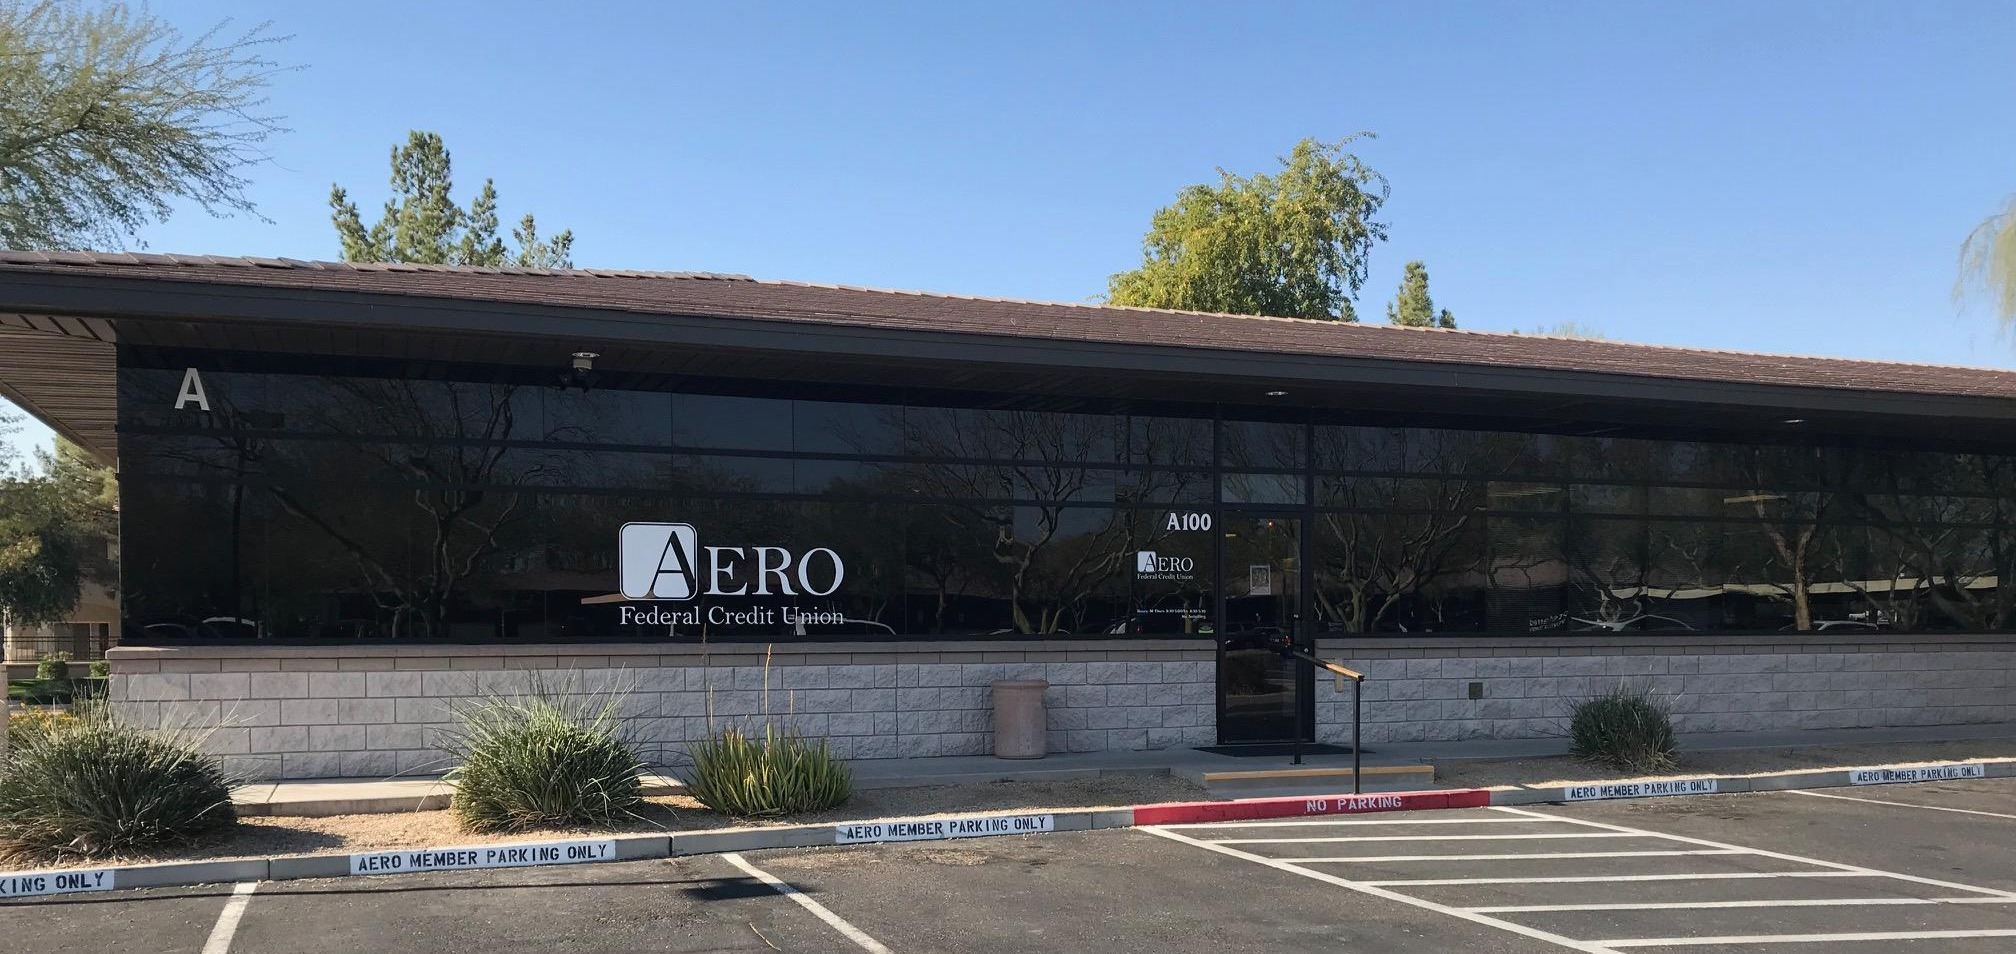 AERO Federal Credit Union